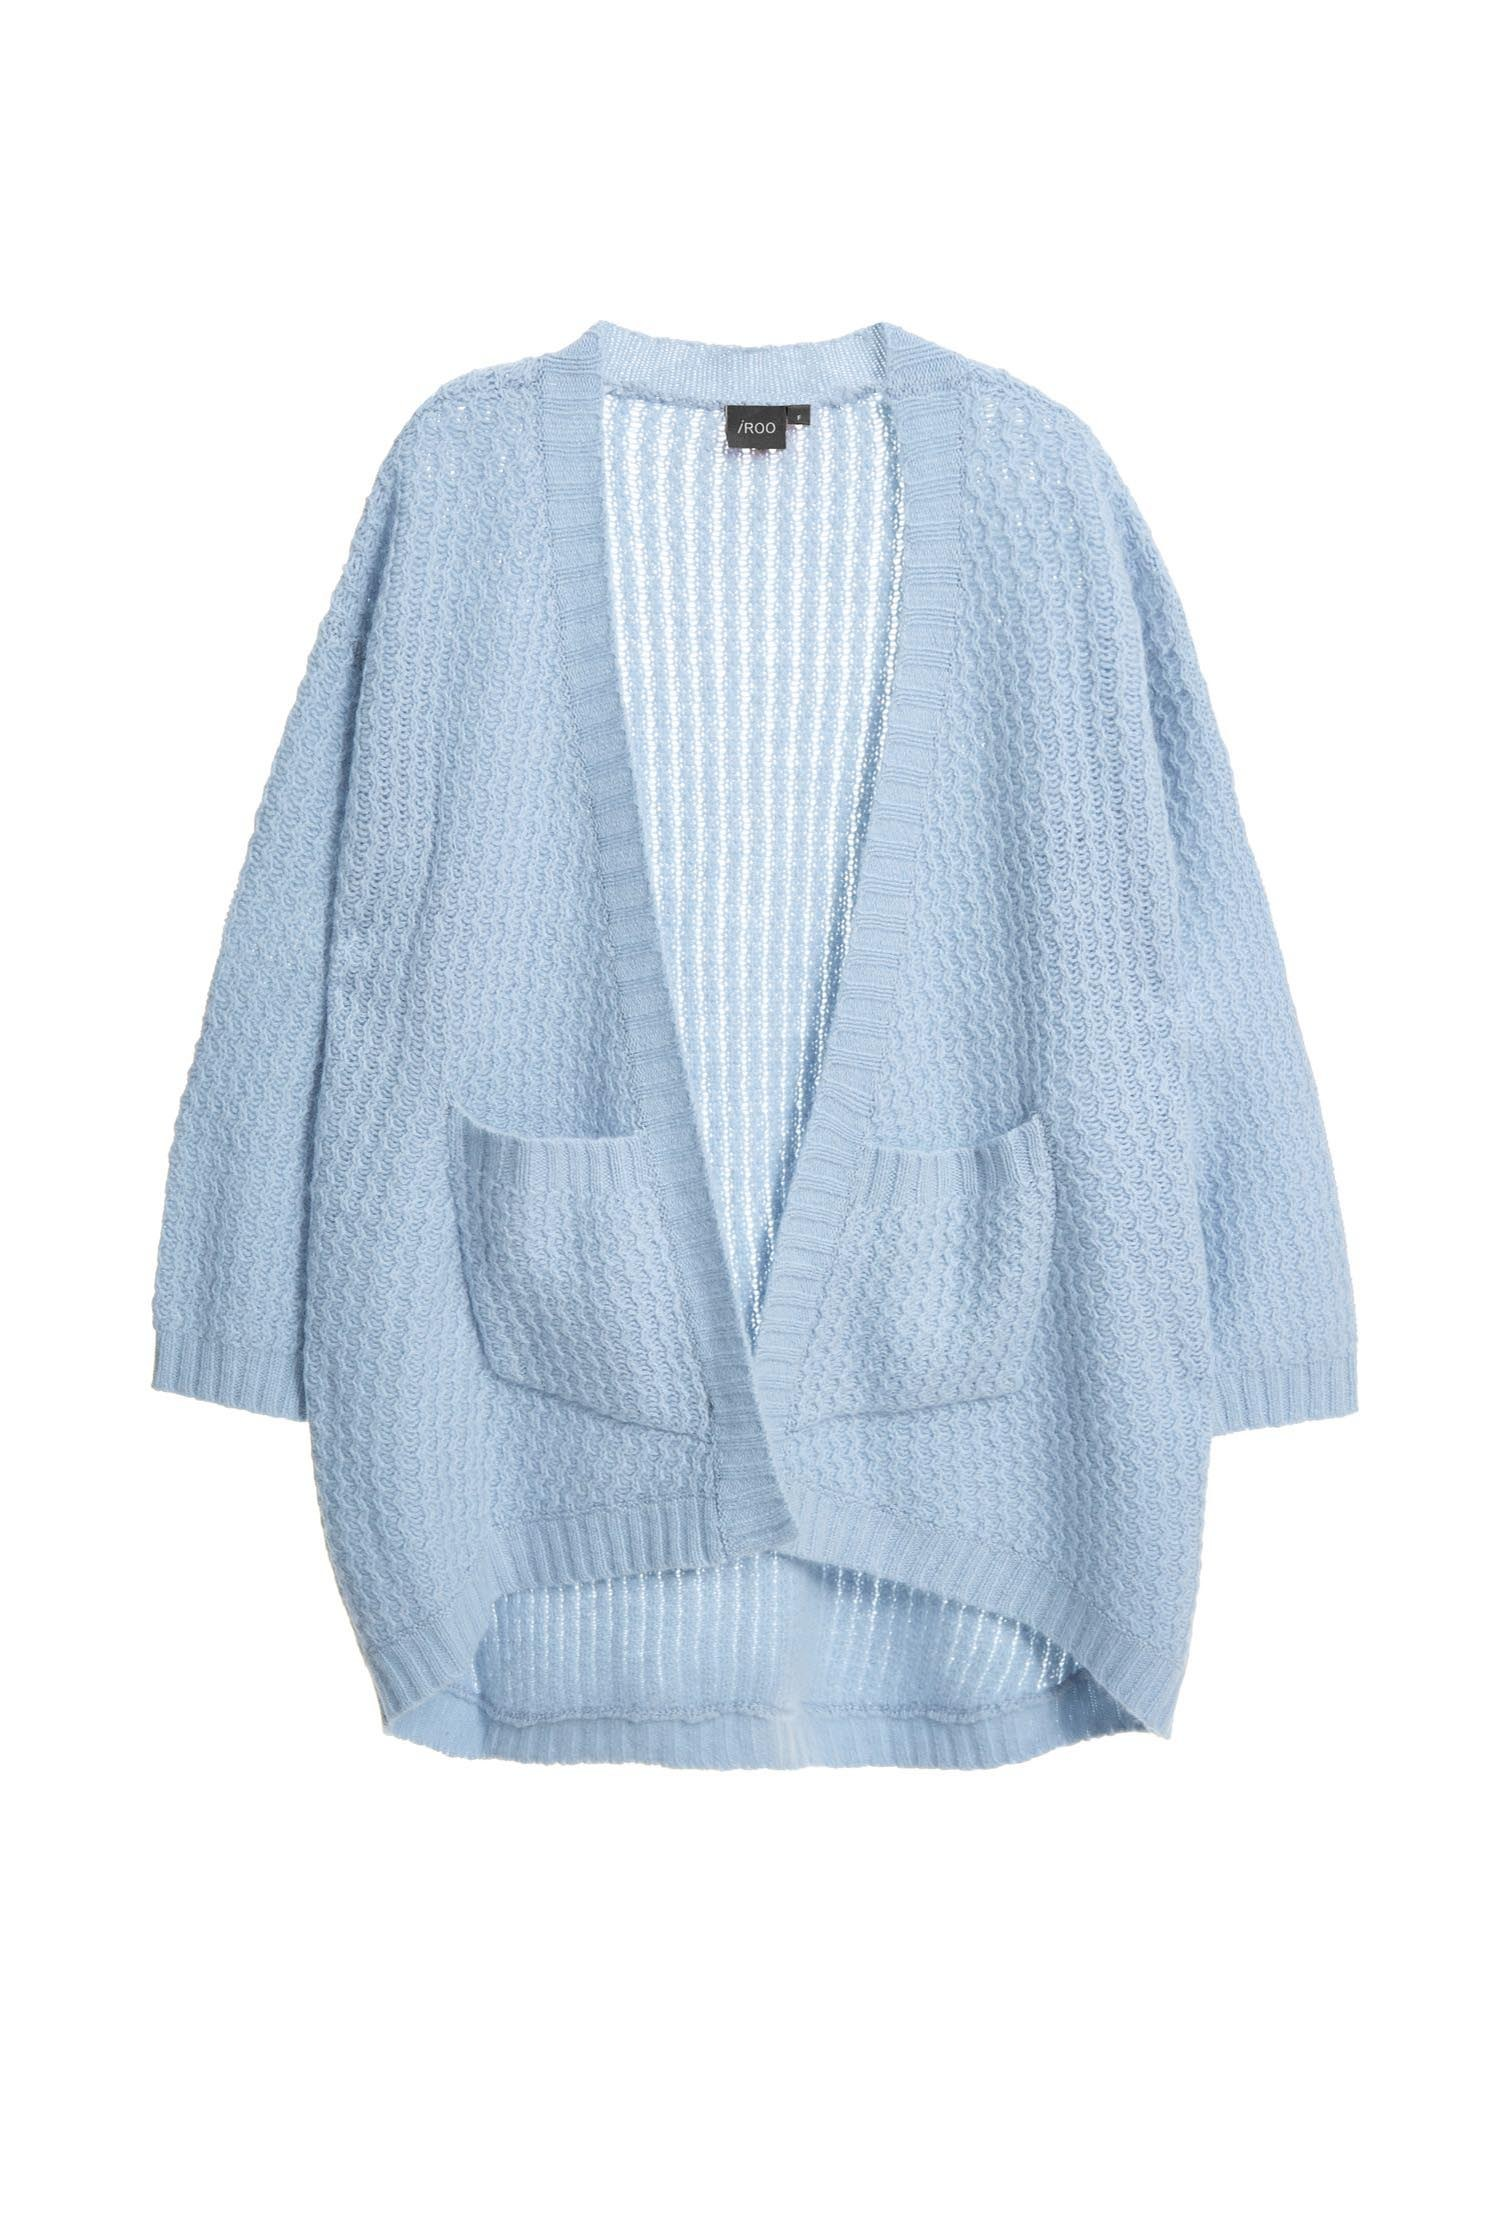 Hemp knitted cardigan,coldforwinter,cardigan,fairlslelife,knitting,knittedjacket,longsleeveouterwear